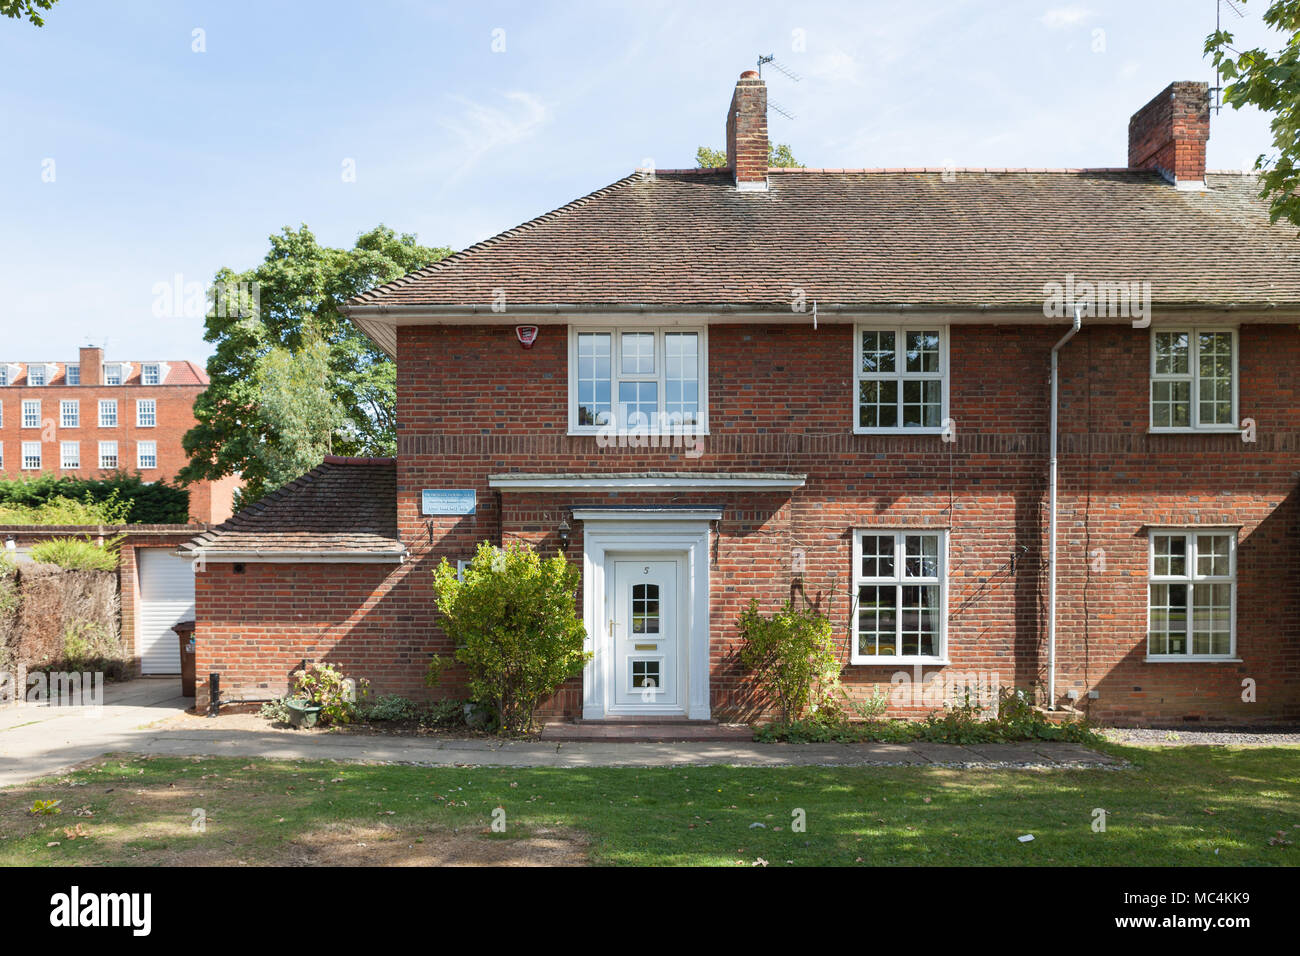 Sir Ebenezer Howard visse in questa casa sulla strada Guessen, a Welwyn Garden City, tra 1923-1928. Foto Stock